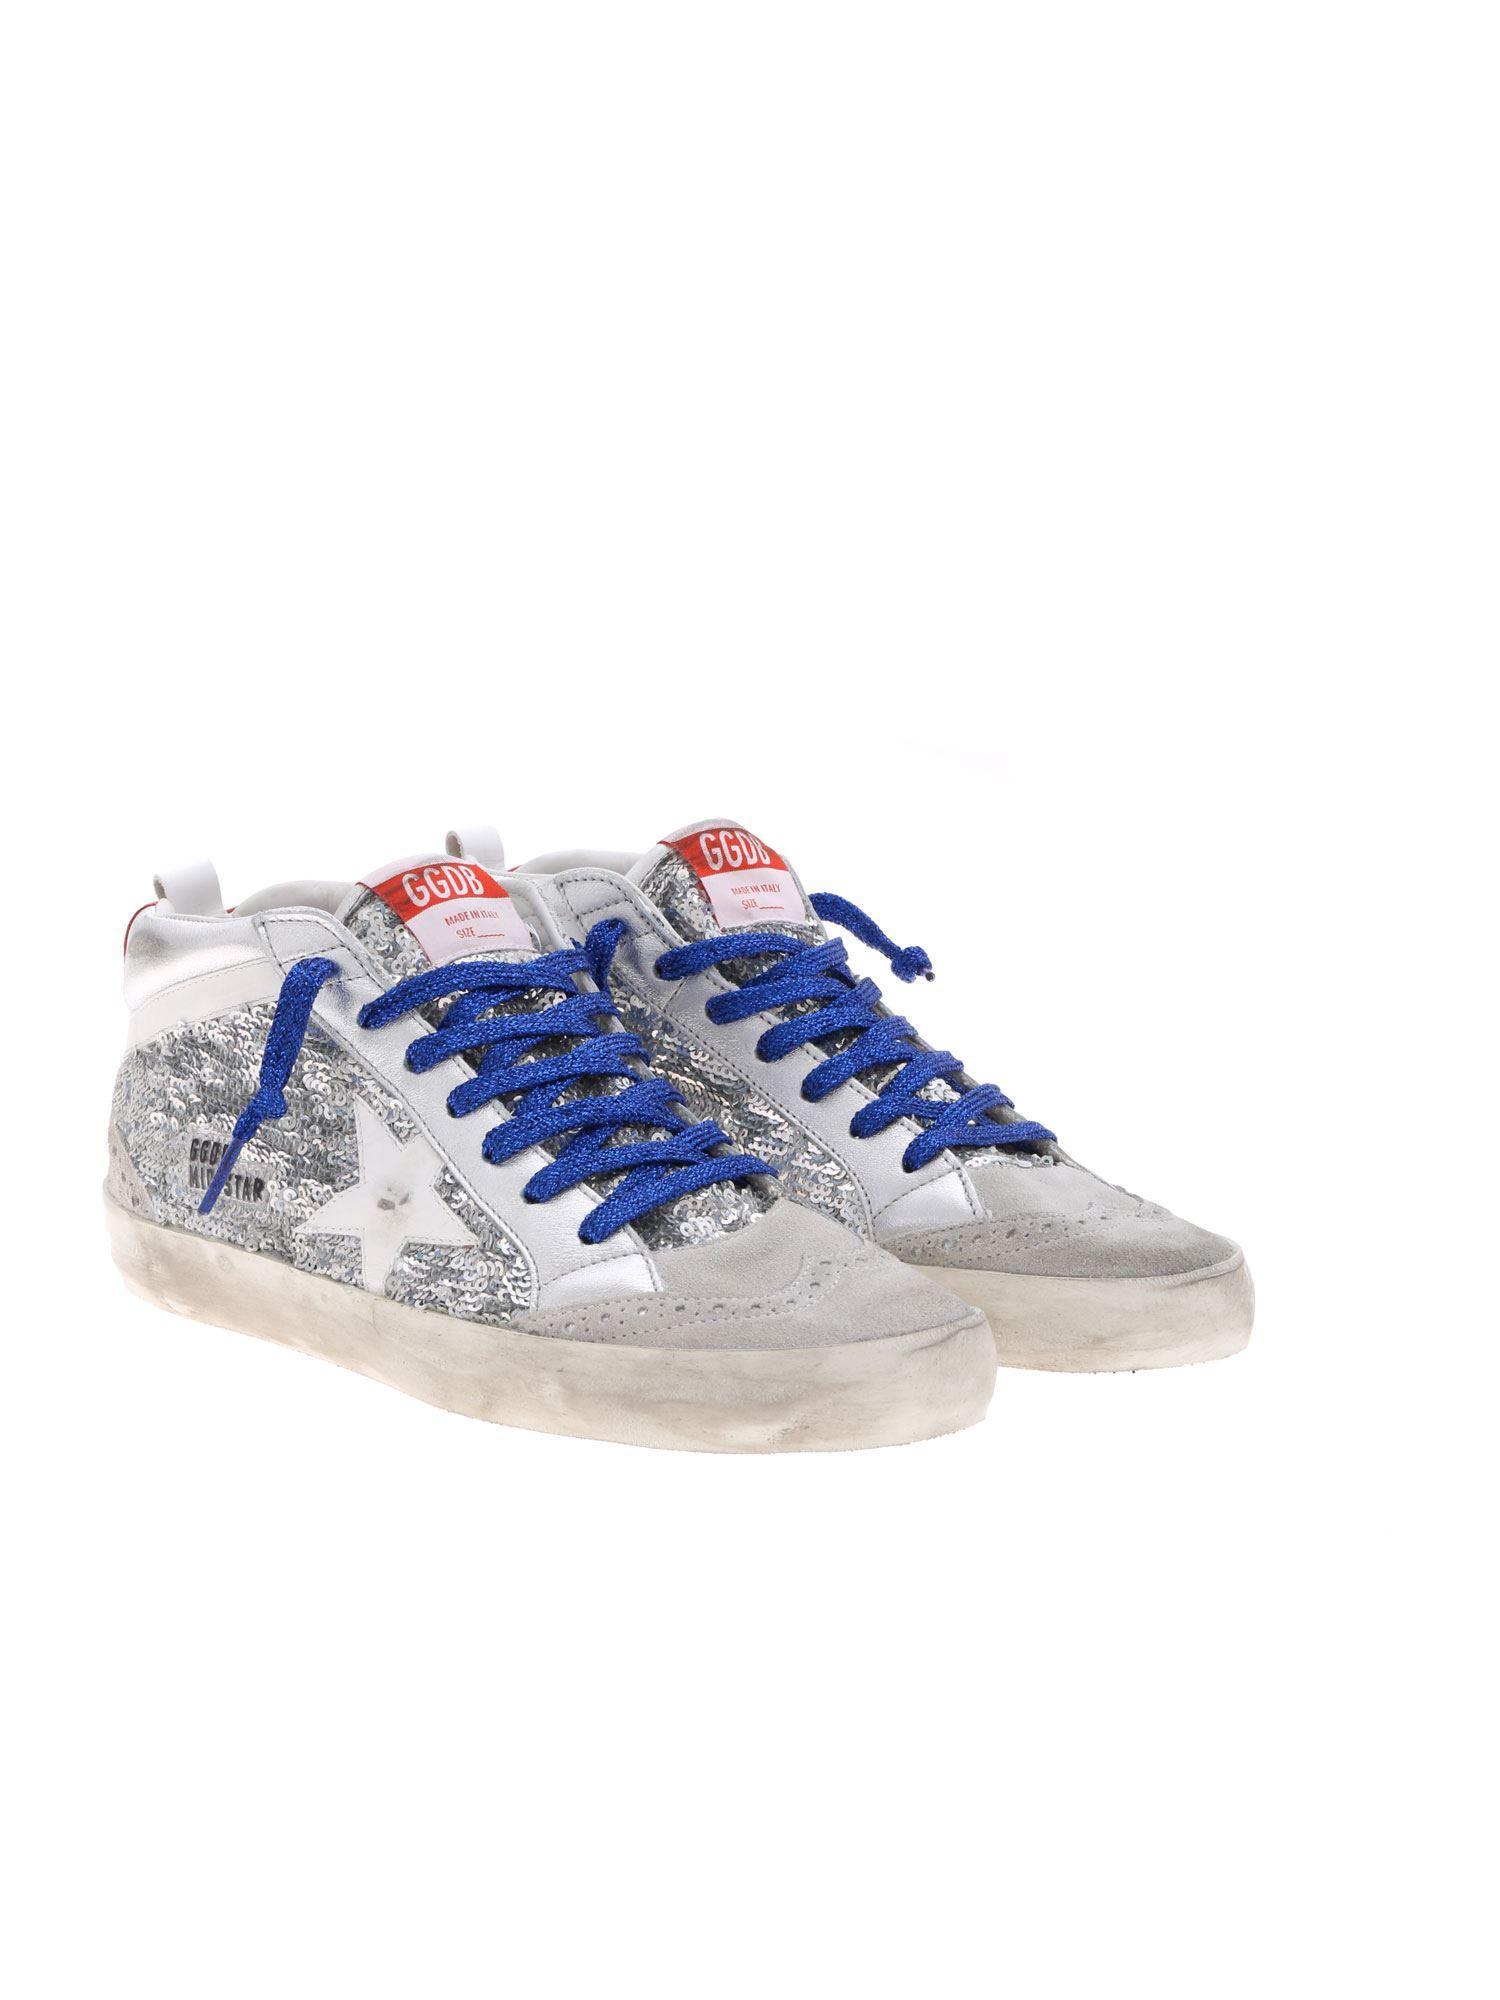 b04ce7bddda7 Lyst - Golden Goose Deluxe Brand Mid Star Sneakers In Grey Suede in Gray